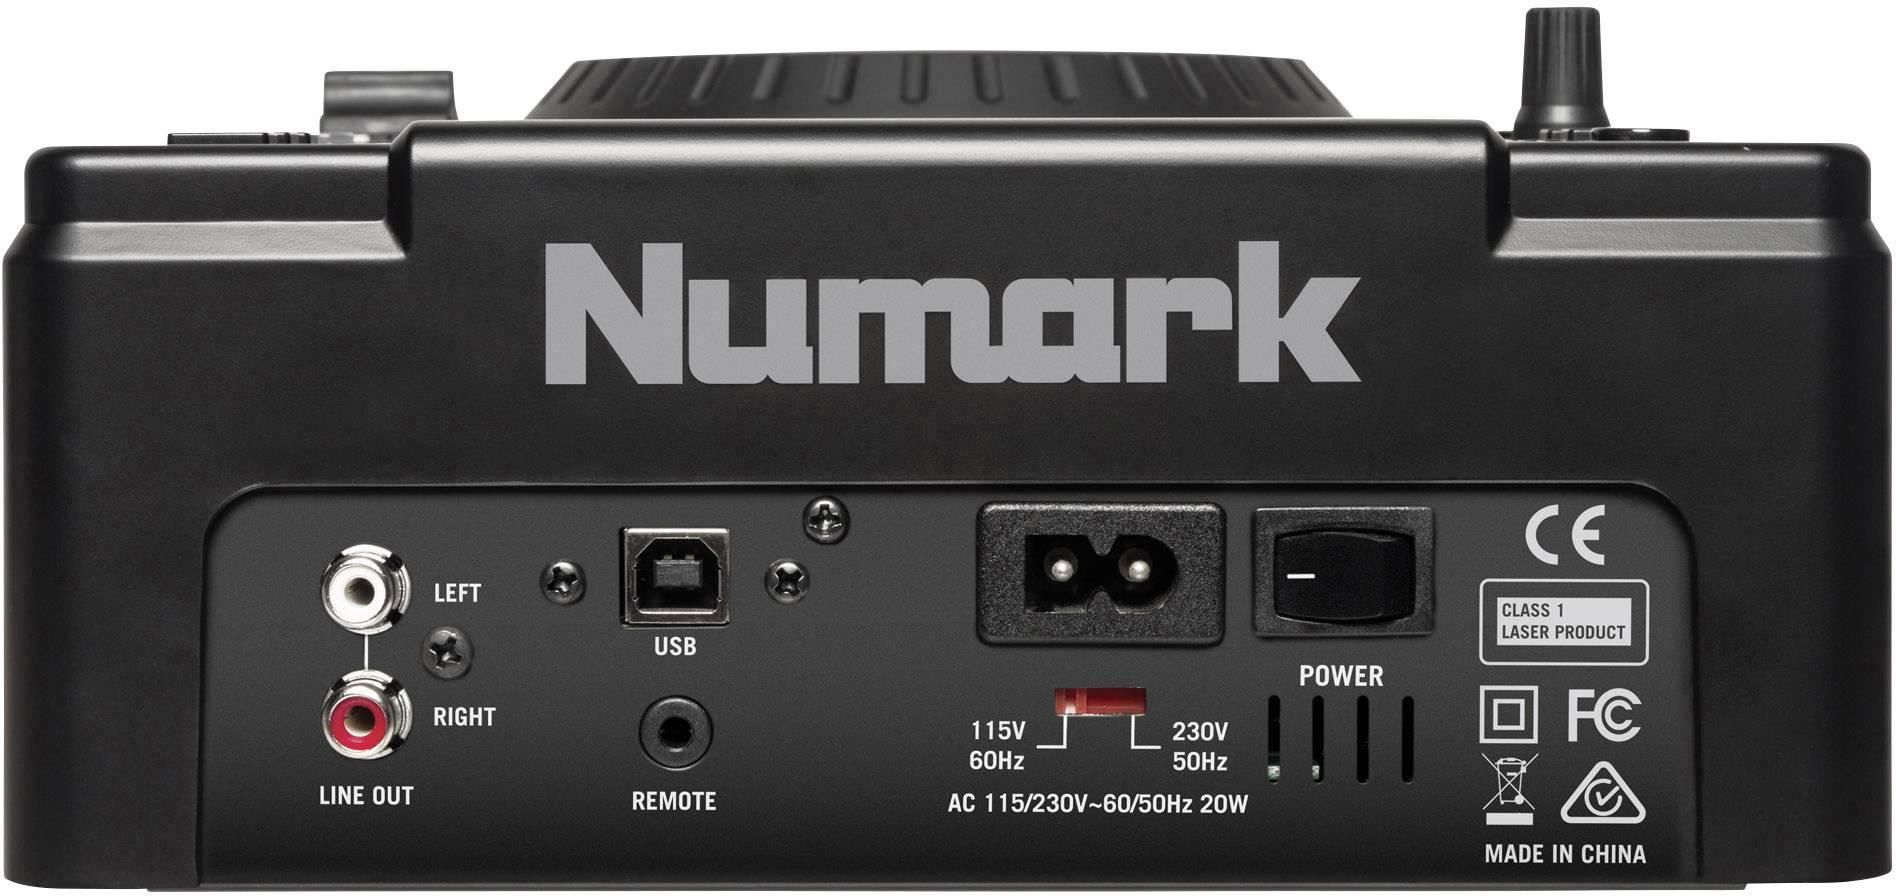 Dj Cd Player Numark Ndx500